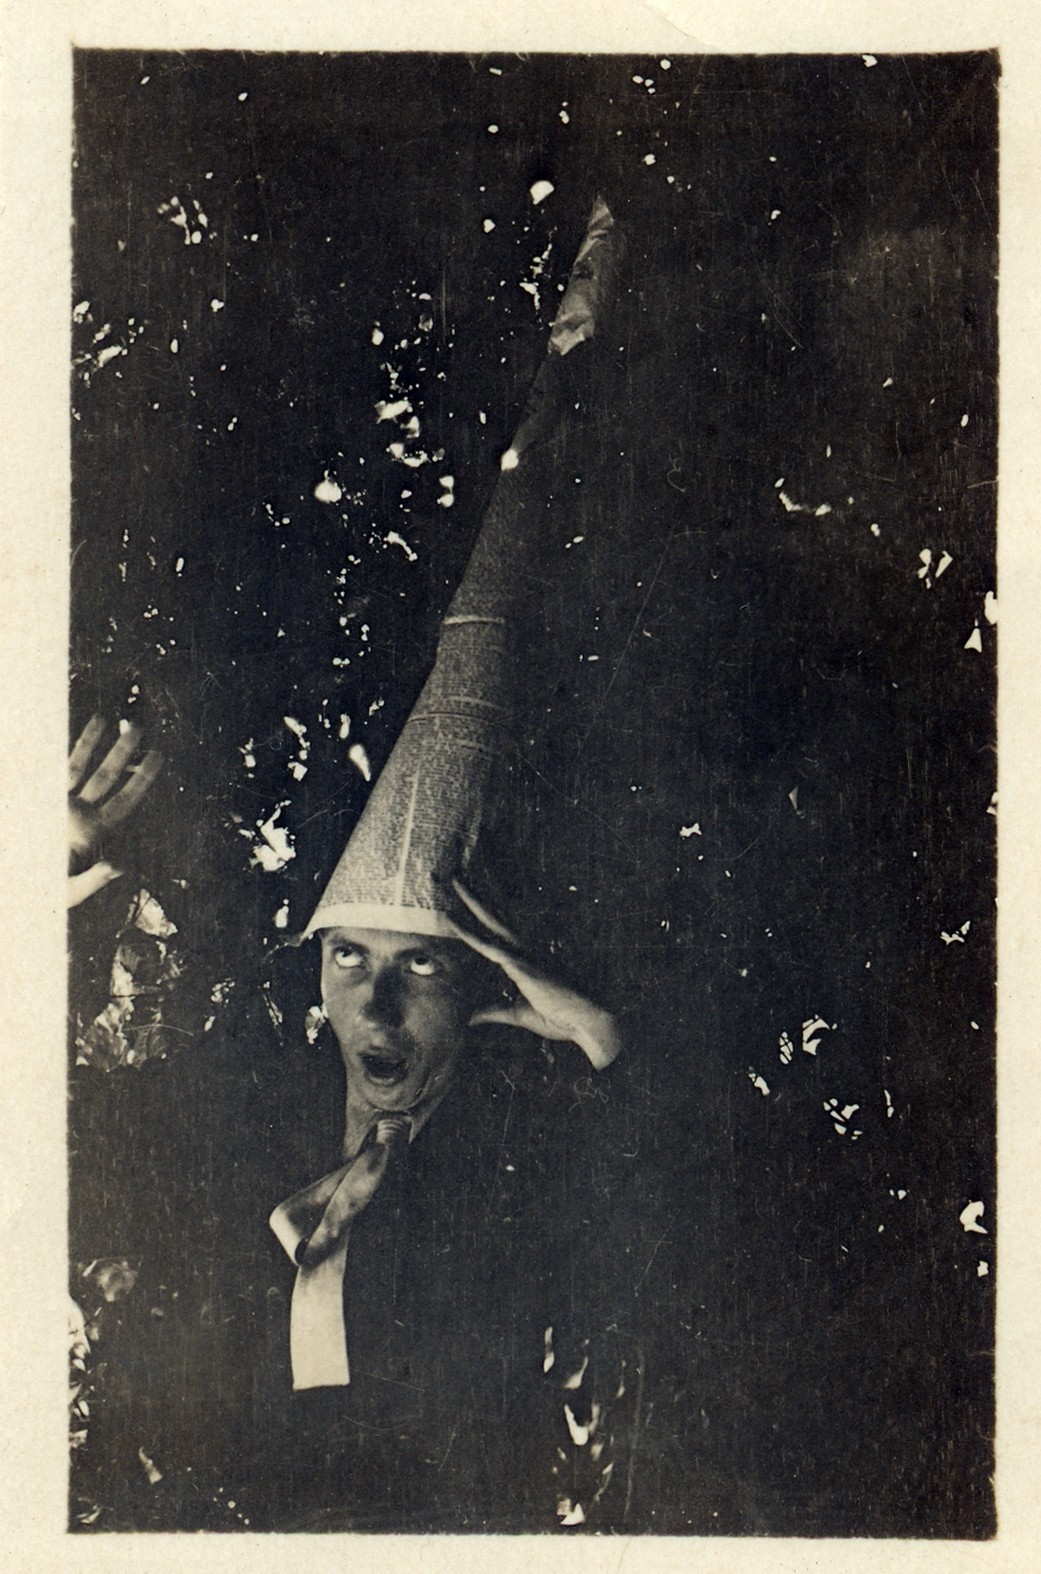 Hans Arp in Weggis, 1911